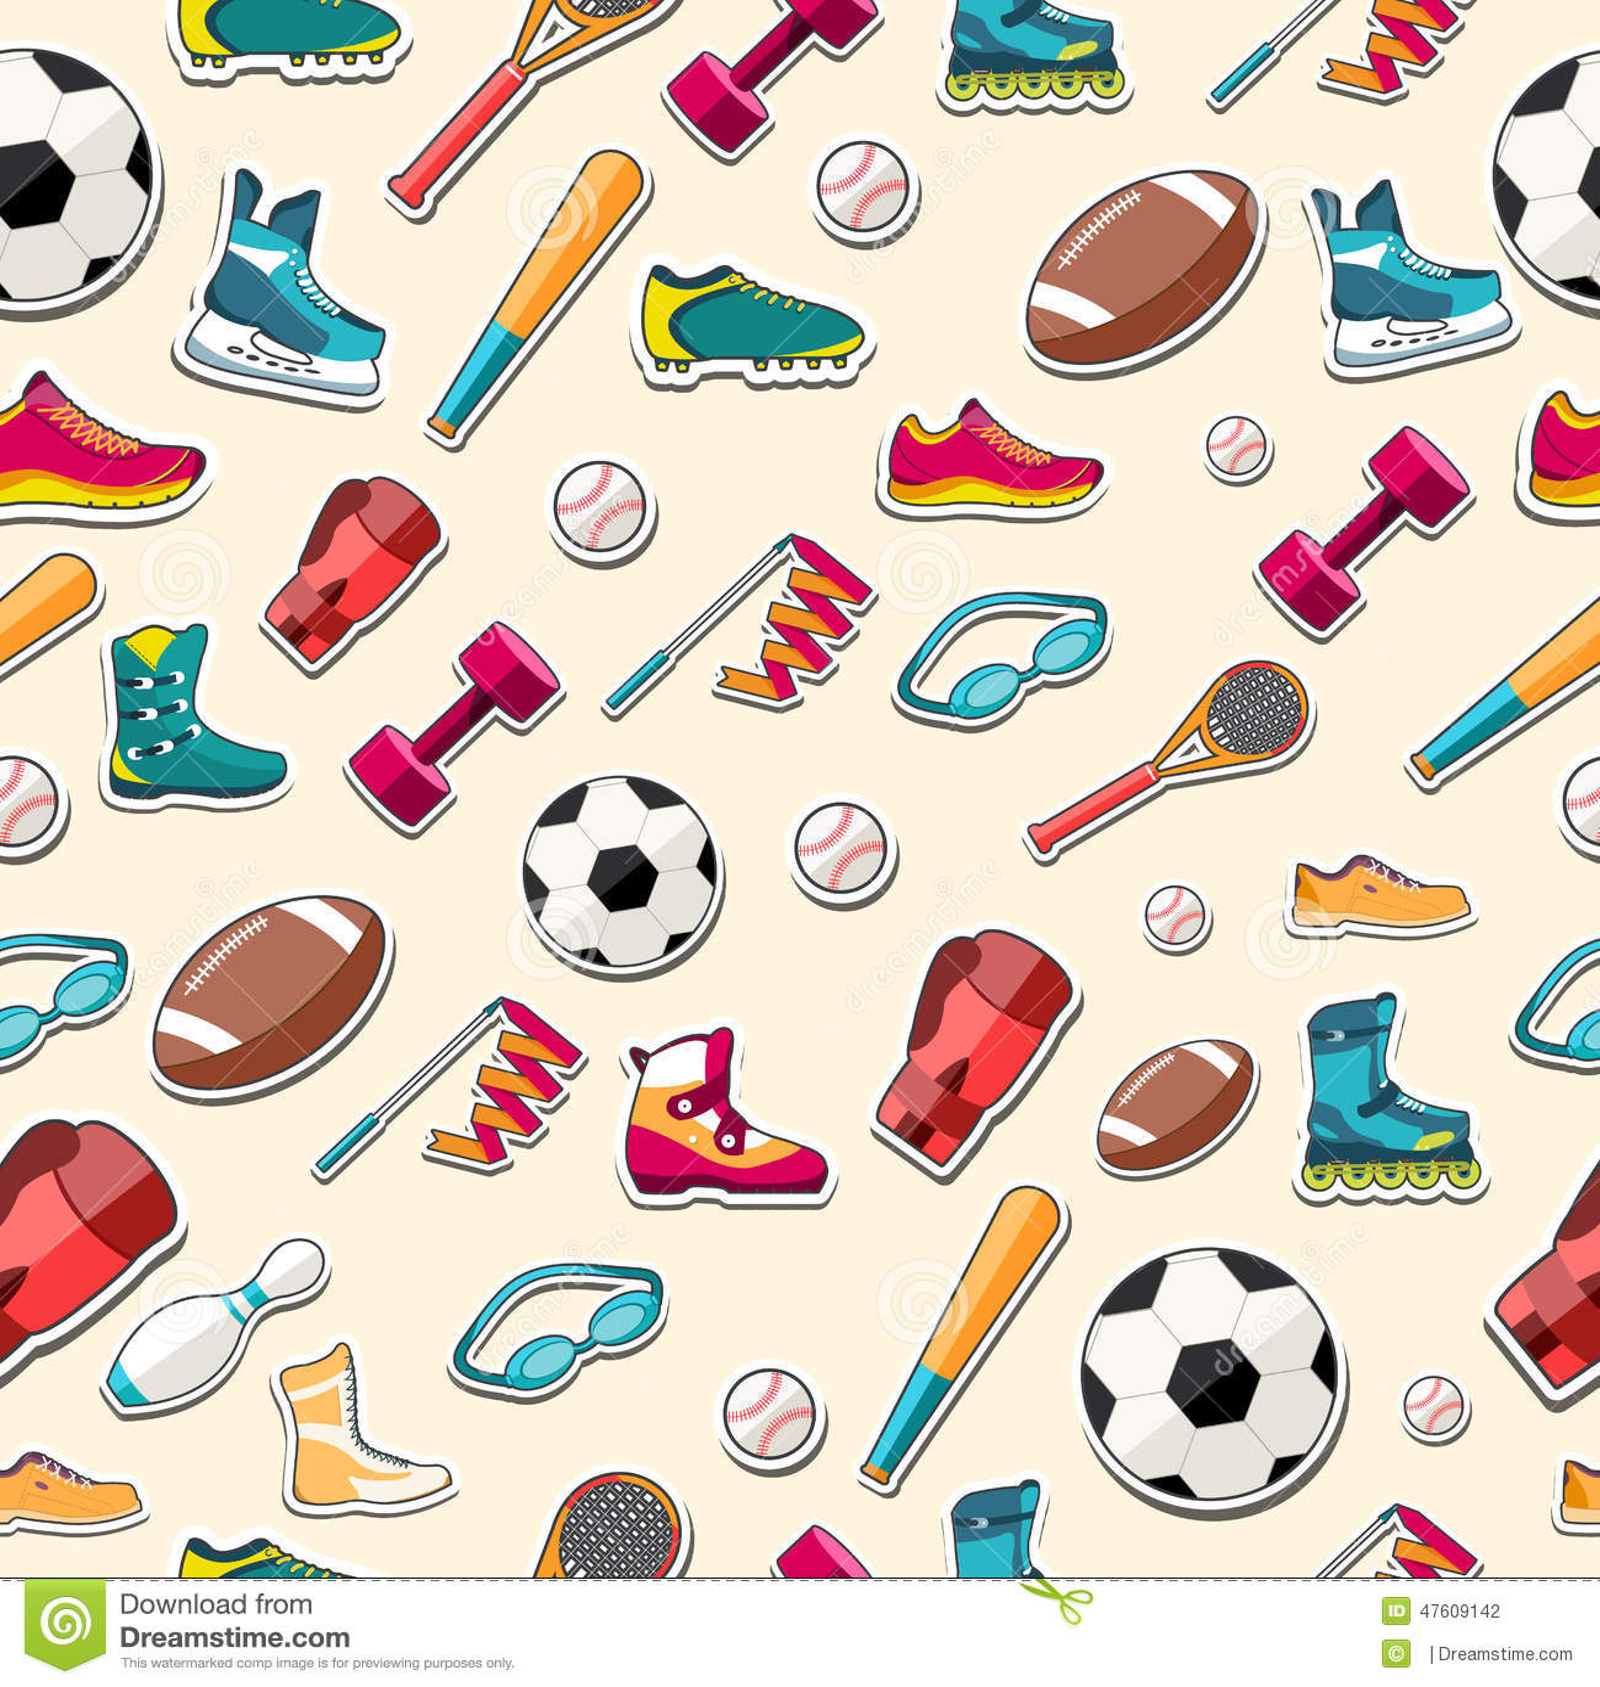 картинки спортивного инвентаря